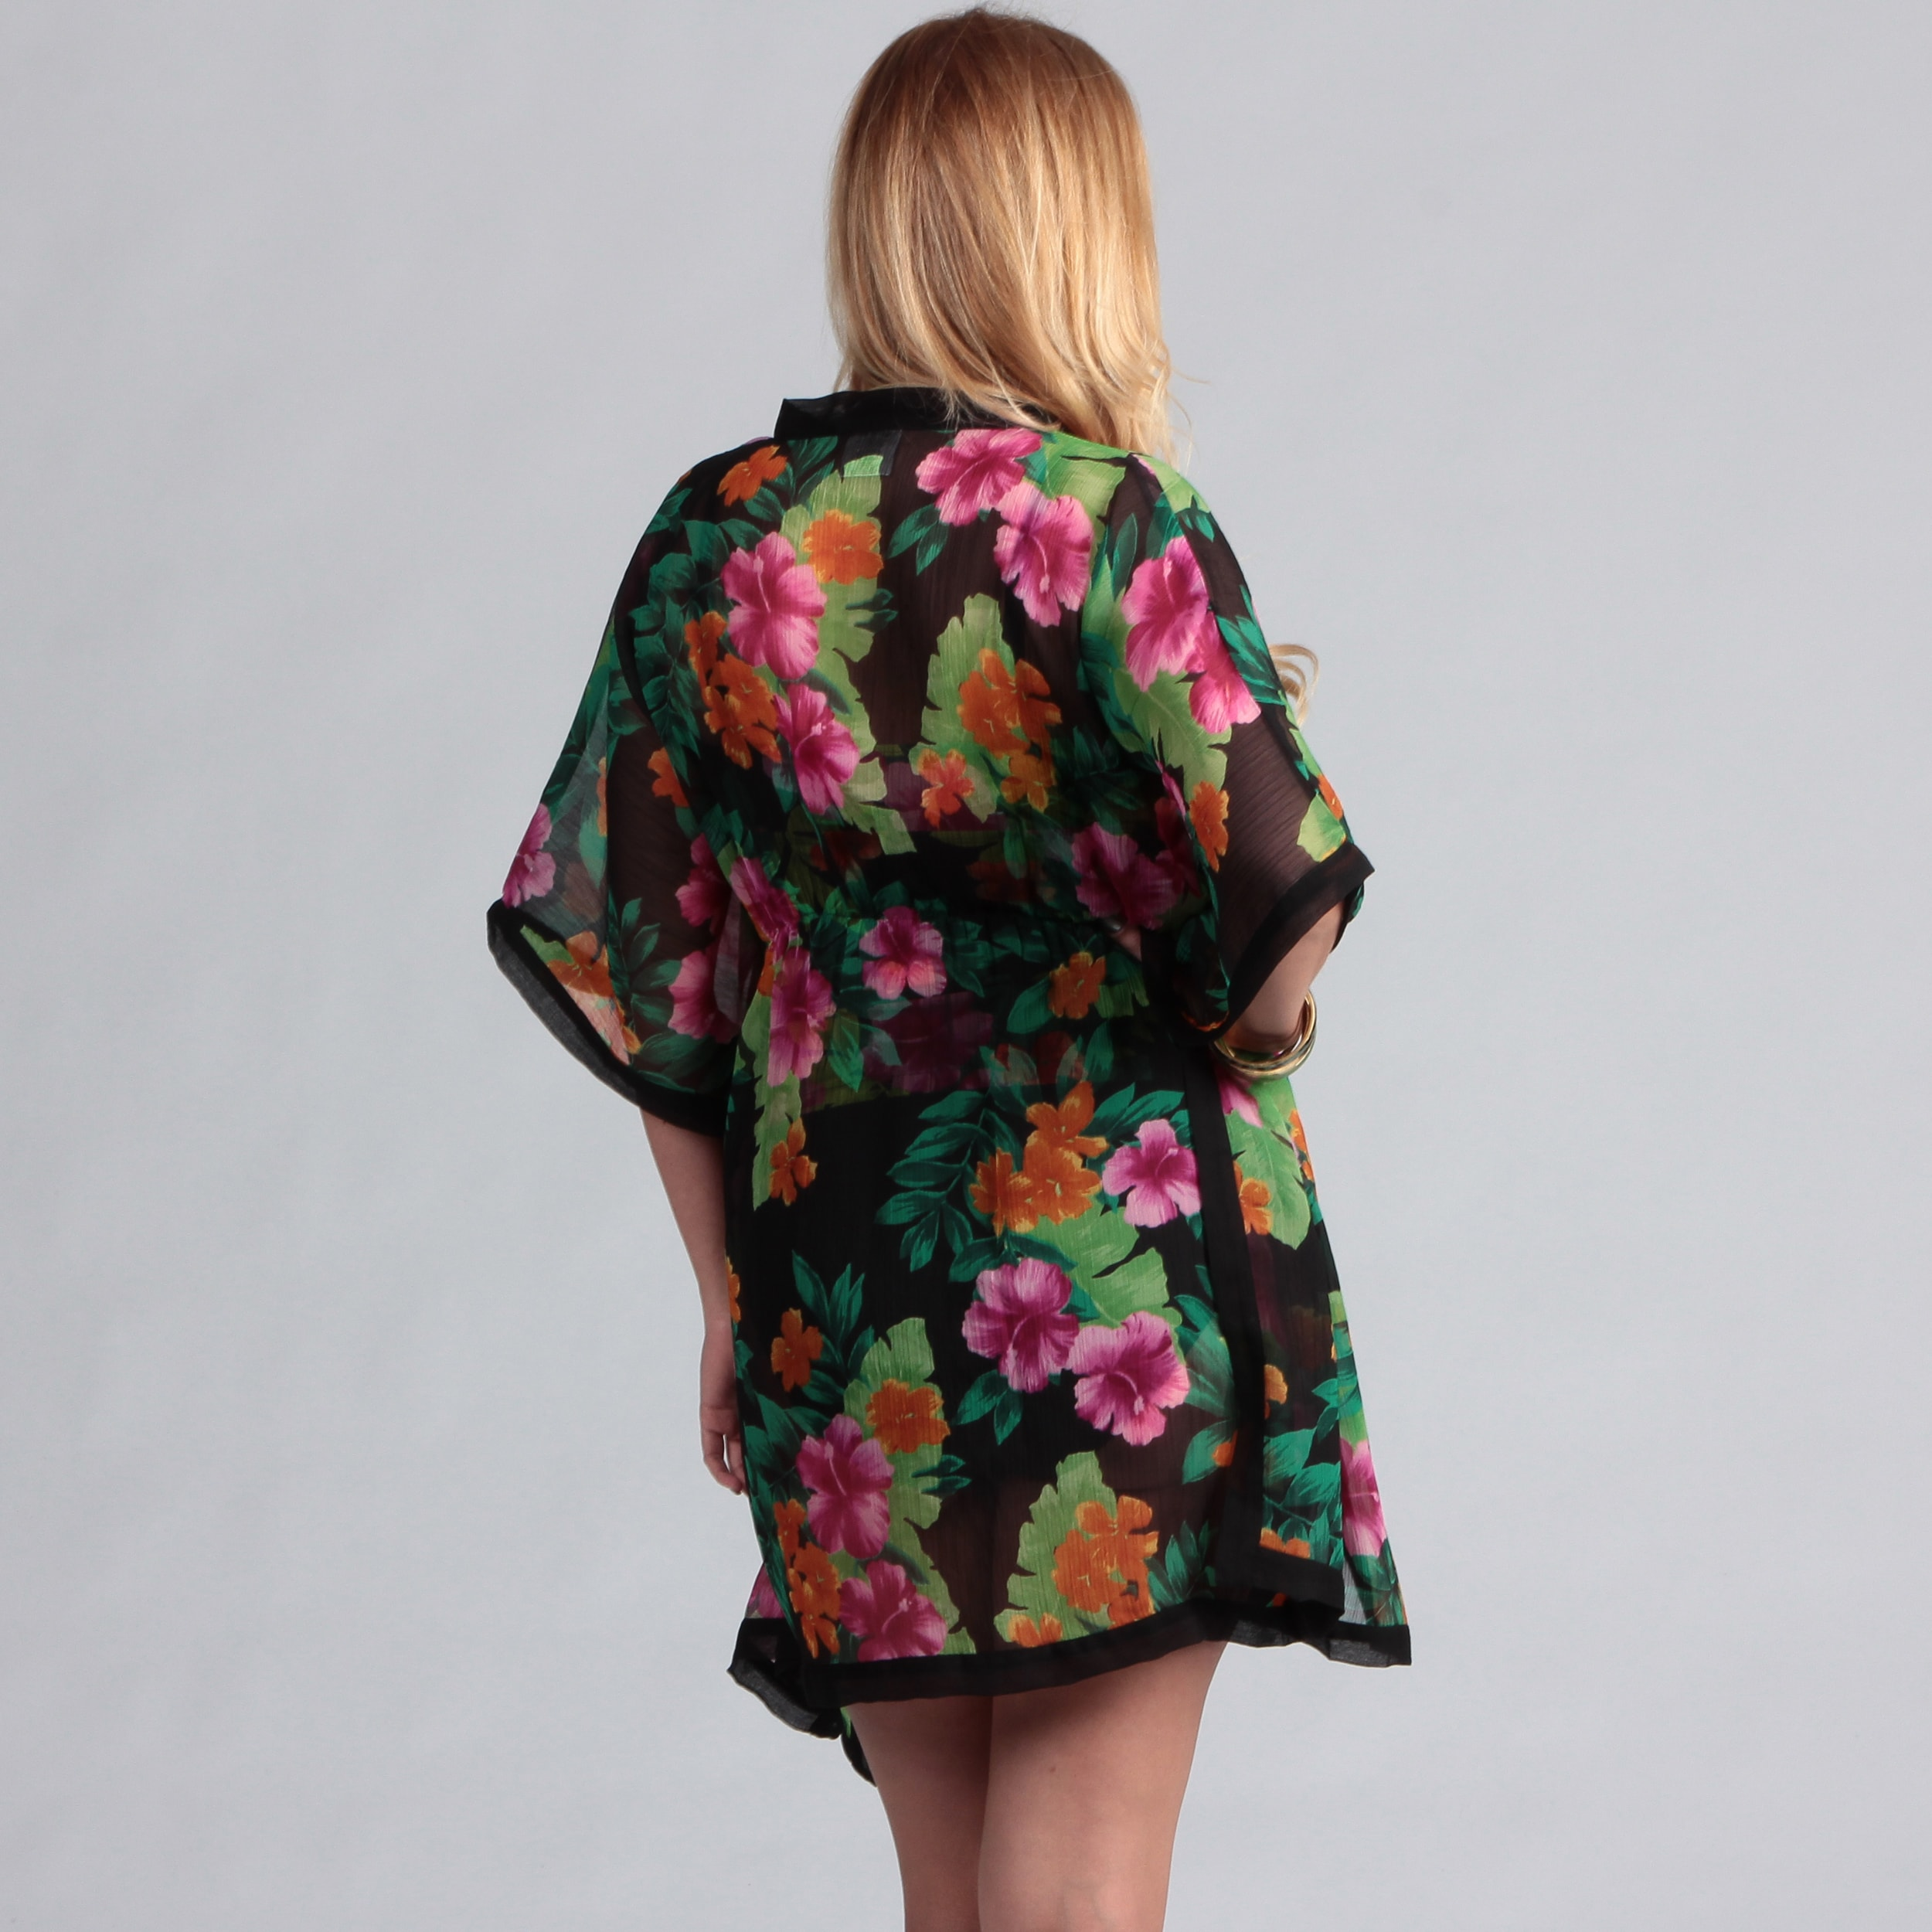 320dc21e7b6d8 Shop Swim by Chuck Handy Coconut Ring Tankini Swimsuit Kimono Coverup - Free  Shipping Today - Overstock - 7193954